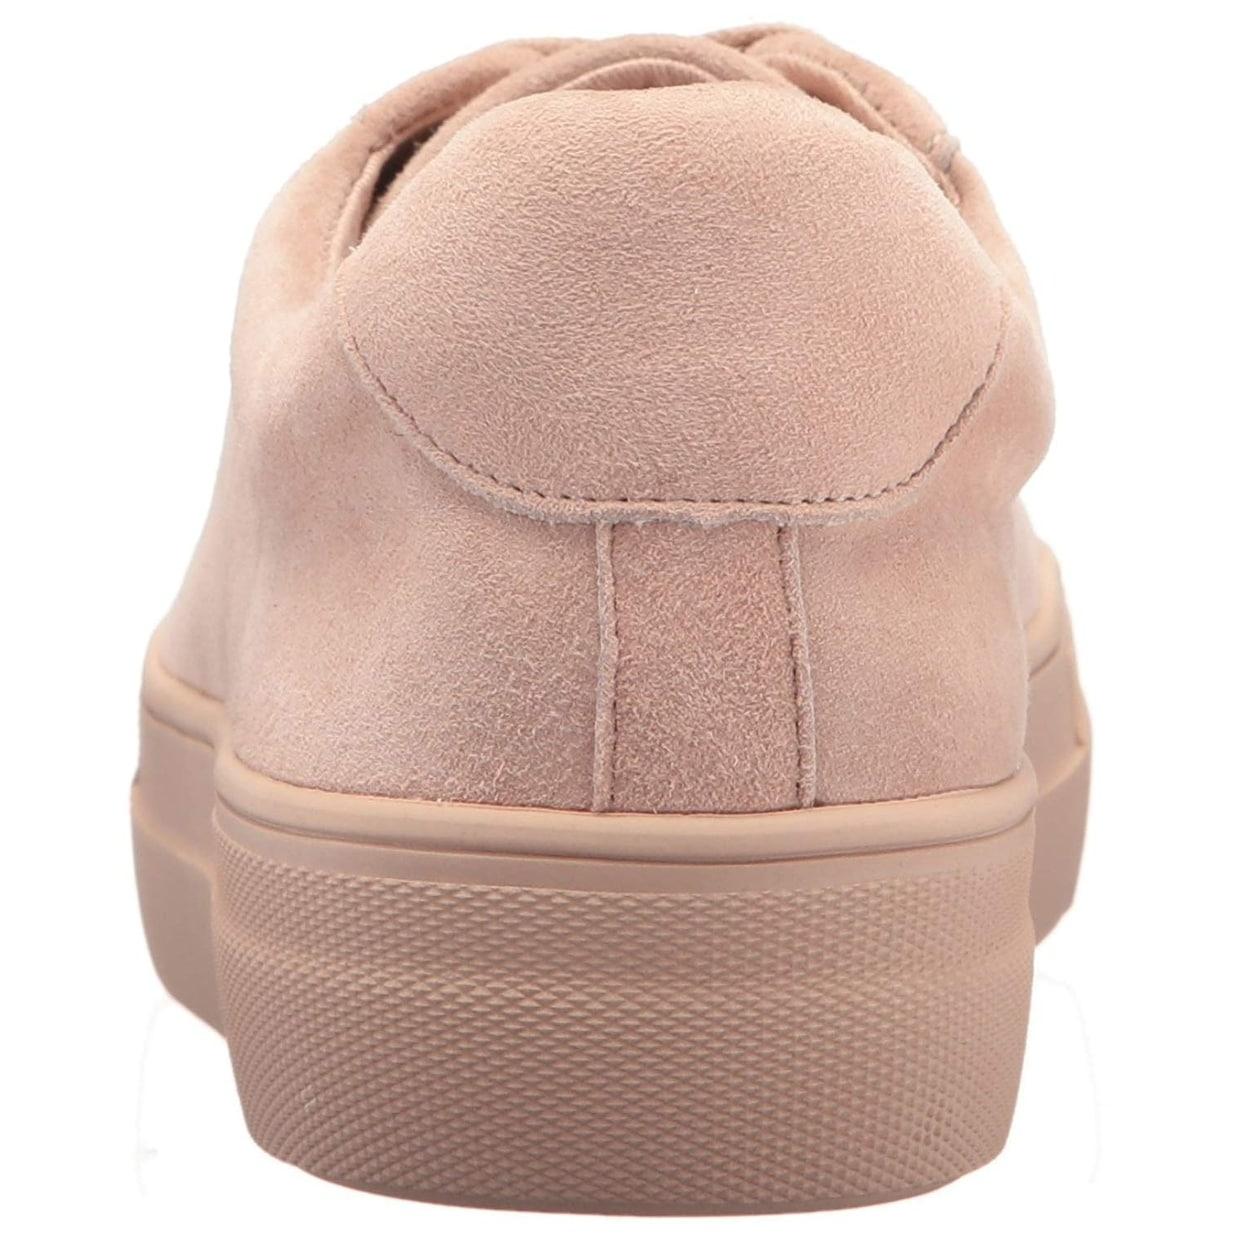 7b8d7b068c4 Shop Steve Madden Women s Gisela Fashion Sneaker - 9.5 - Free Shipping On  Orders Over  45 - Overstock - 23532574